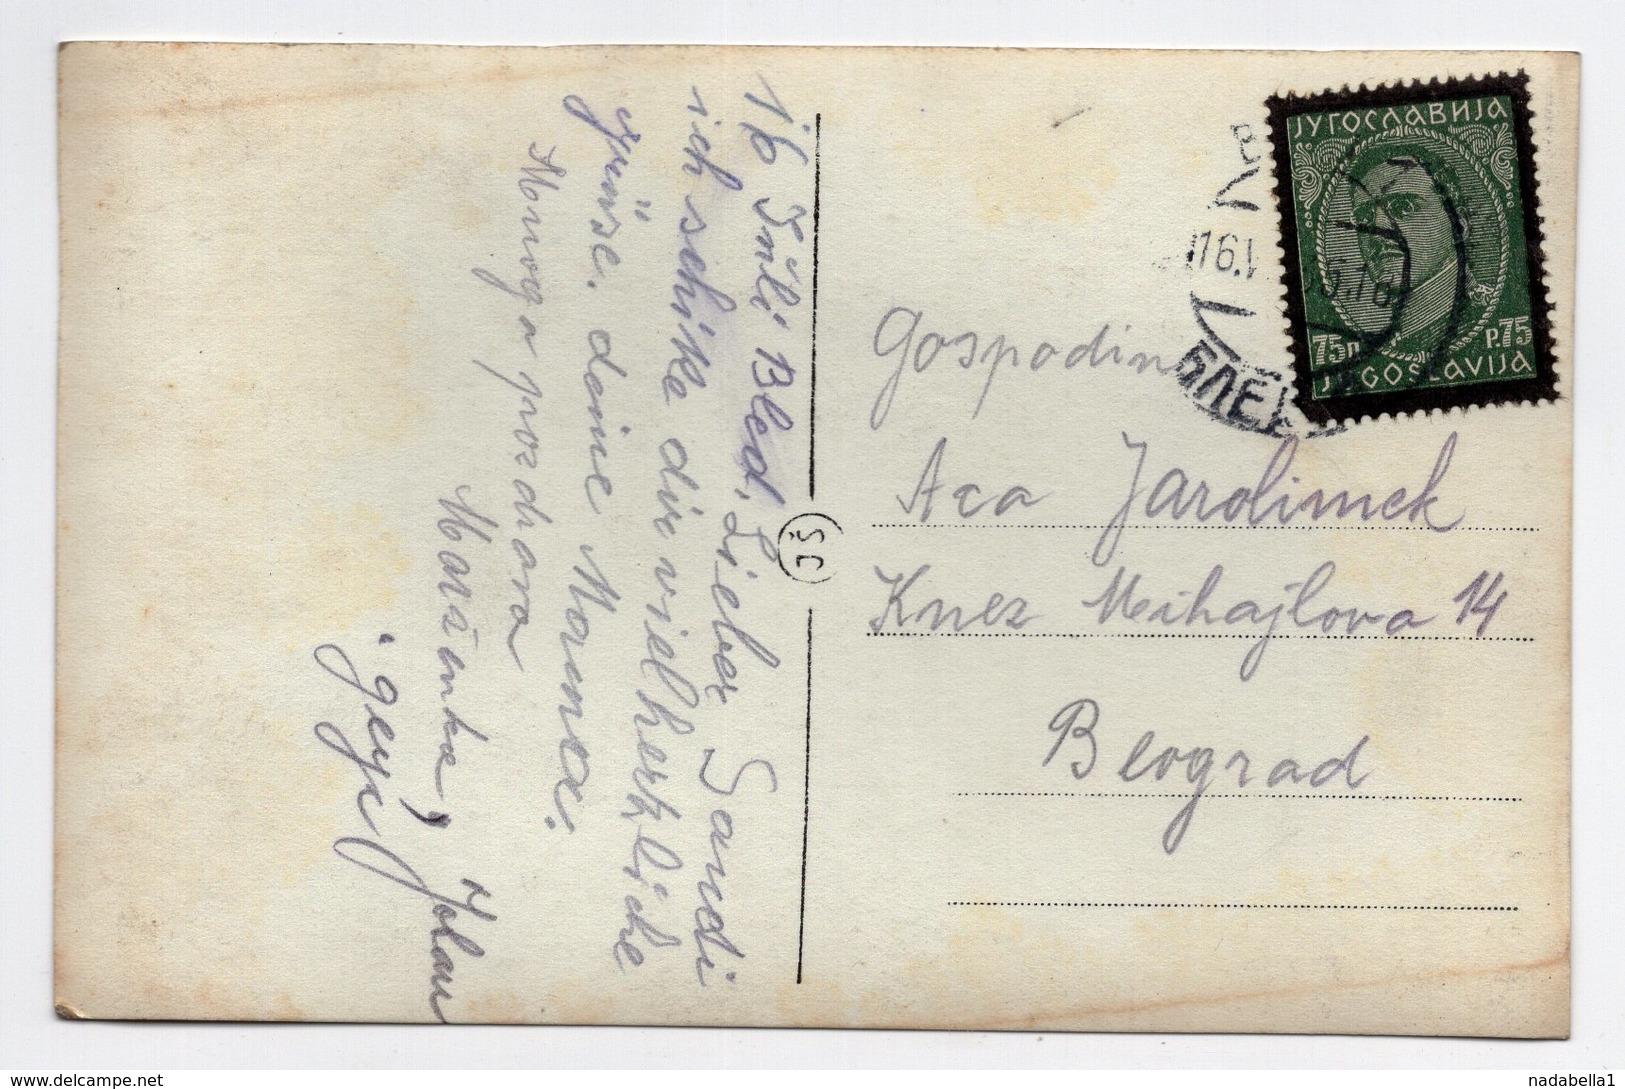 16.07.1935 YUGOSLAVIA, SLOVENIA, BLED TO BELGRADE, ORIGINAL PHOTOGRAPH, VINTAGE CAR, ILLUSTRATED POSTCARD USED - Yugoslavia